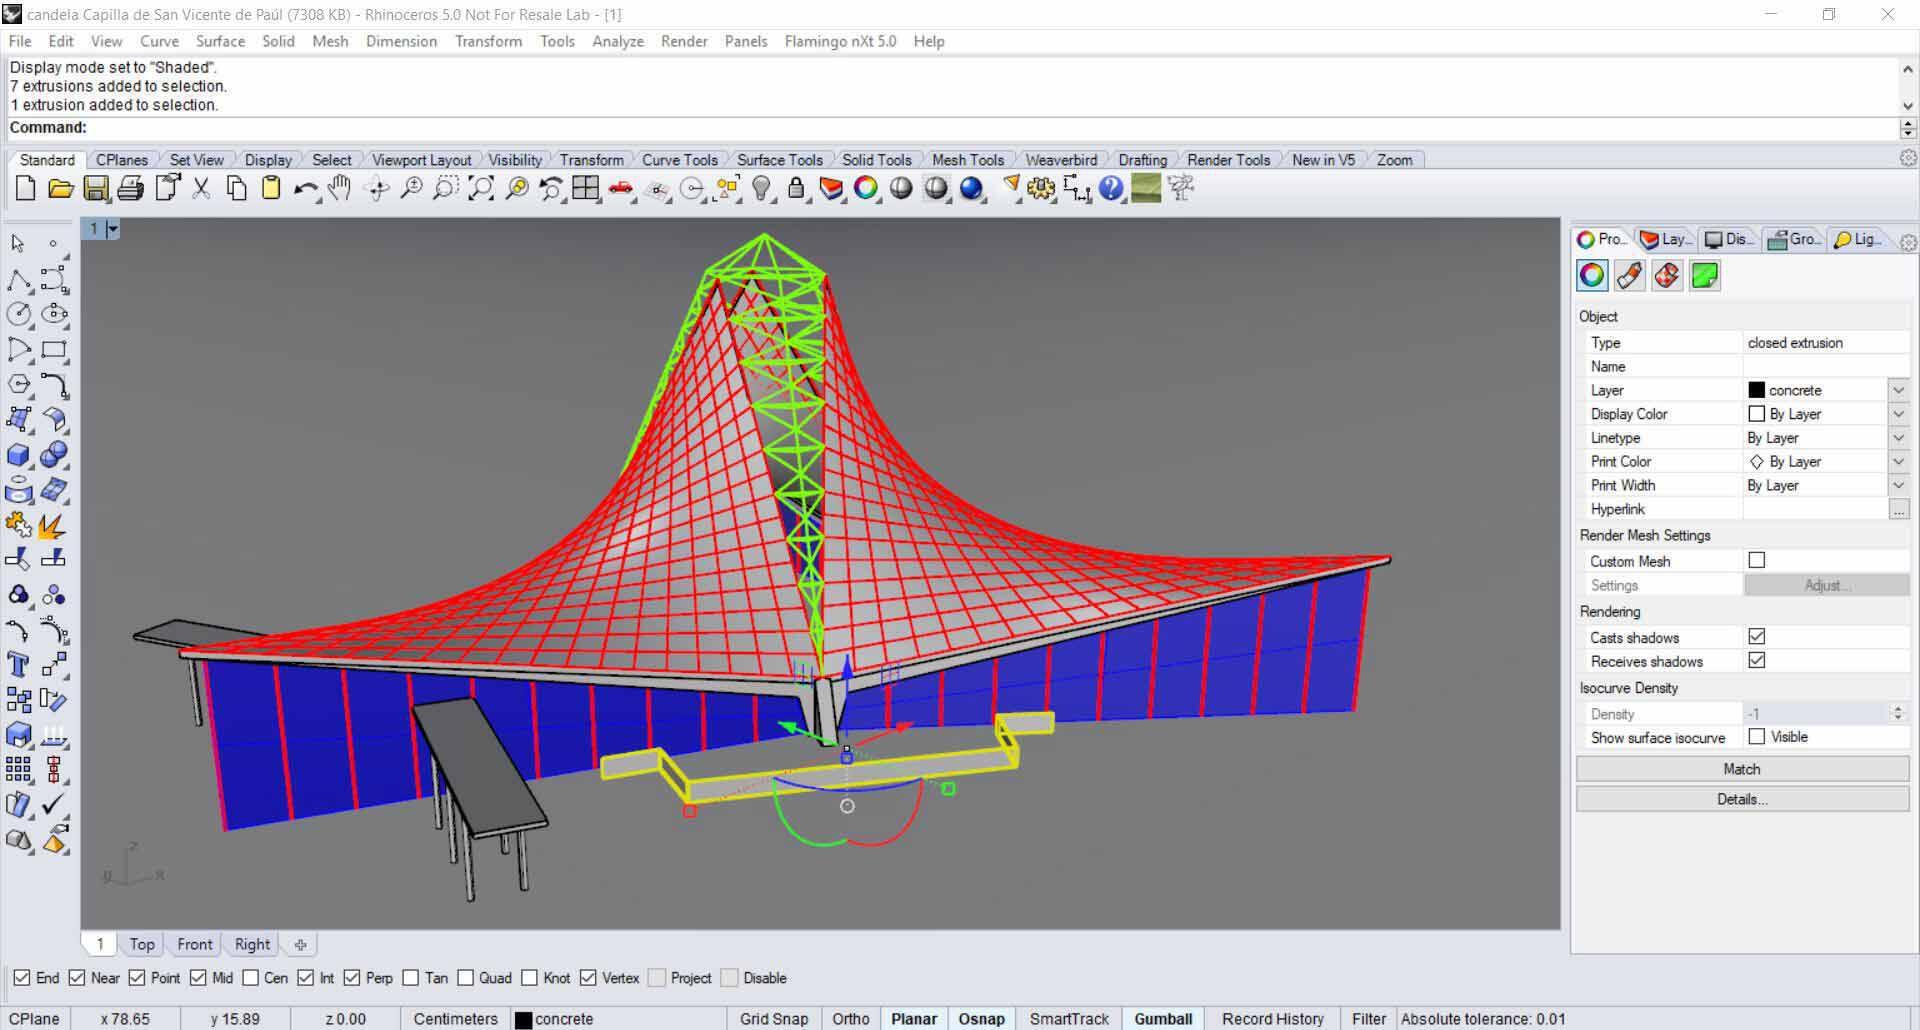 Felix Candela's Chapel - Rhino Lvl 1 - Decode Fab Lab